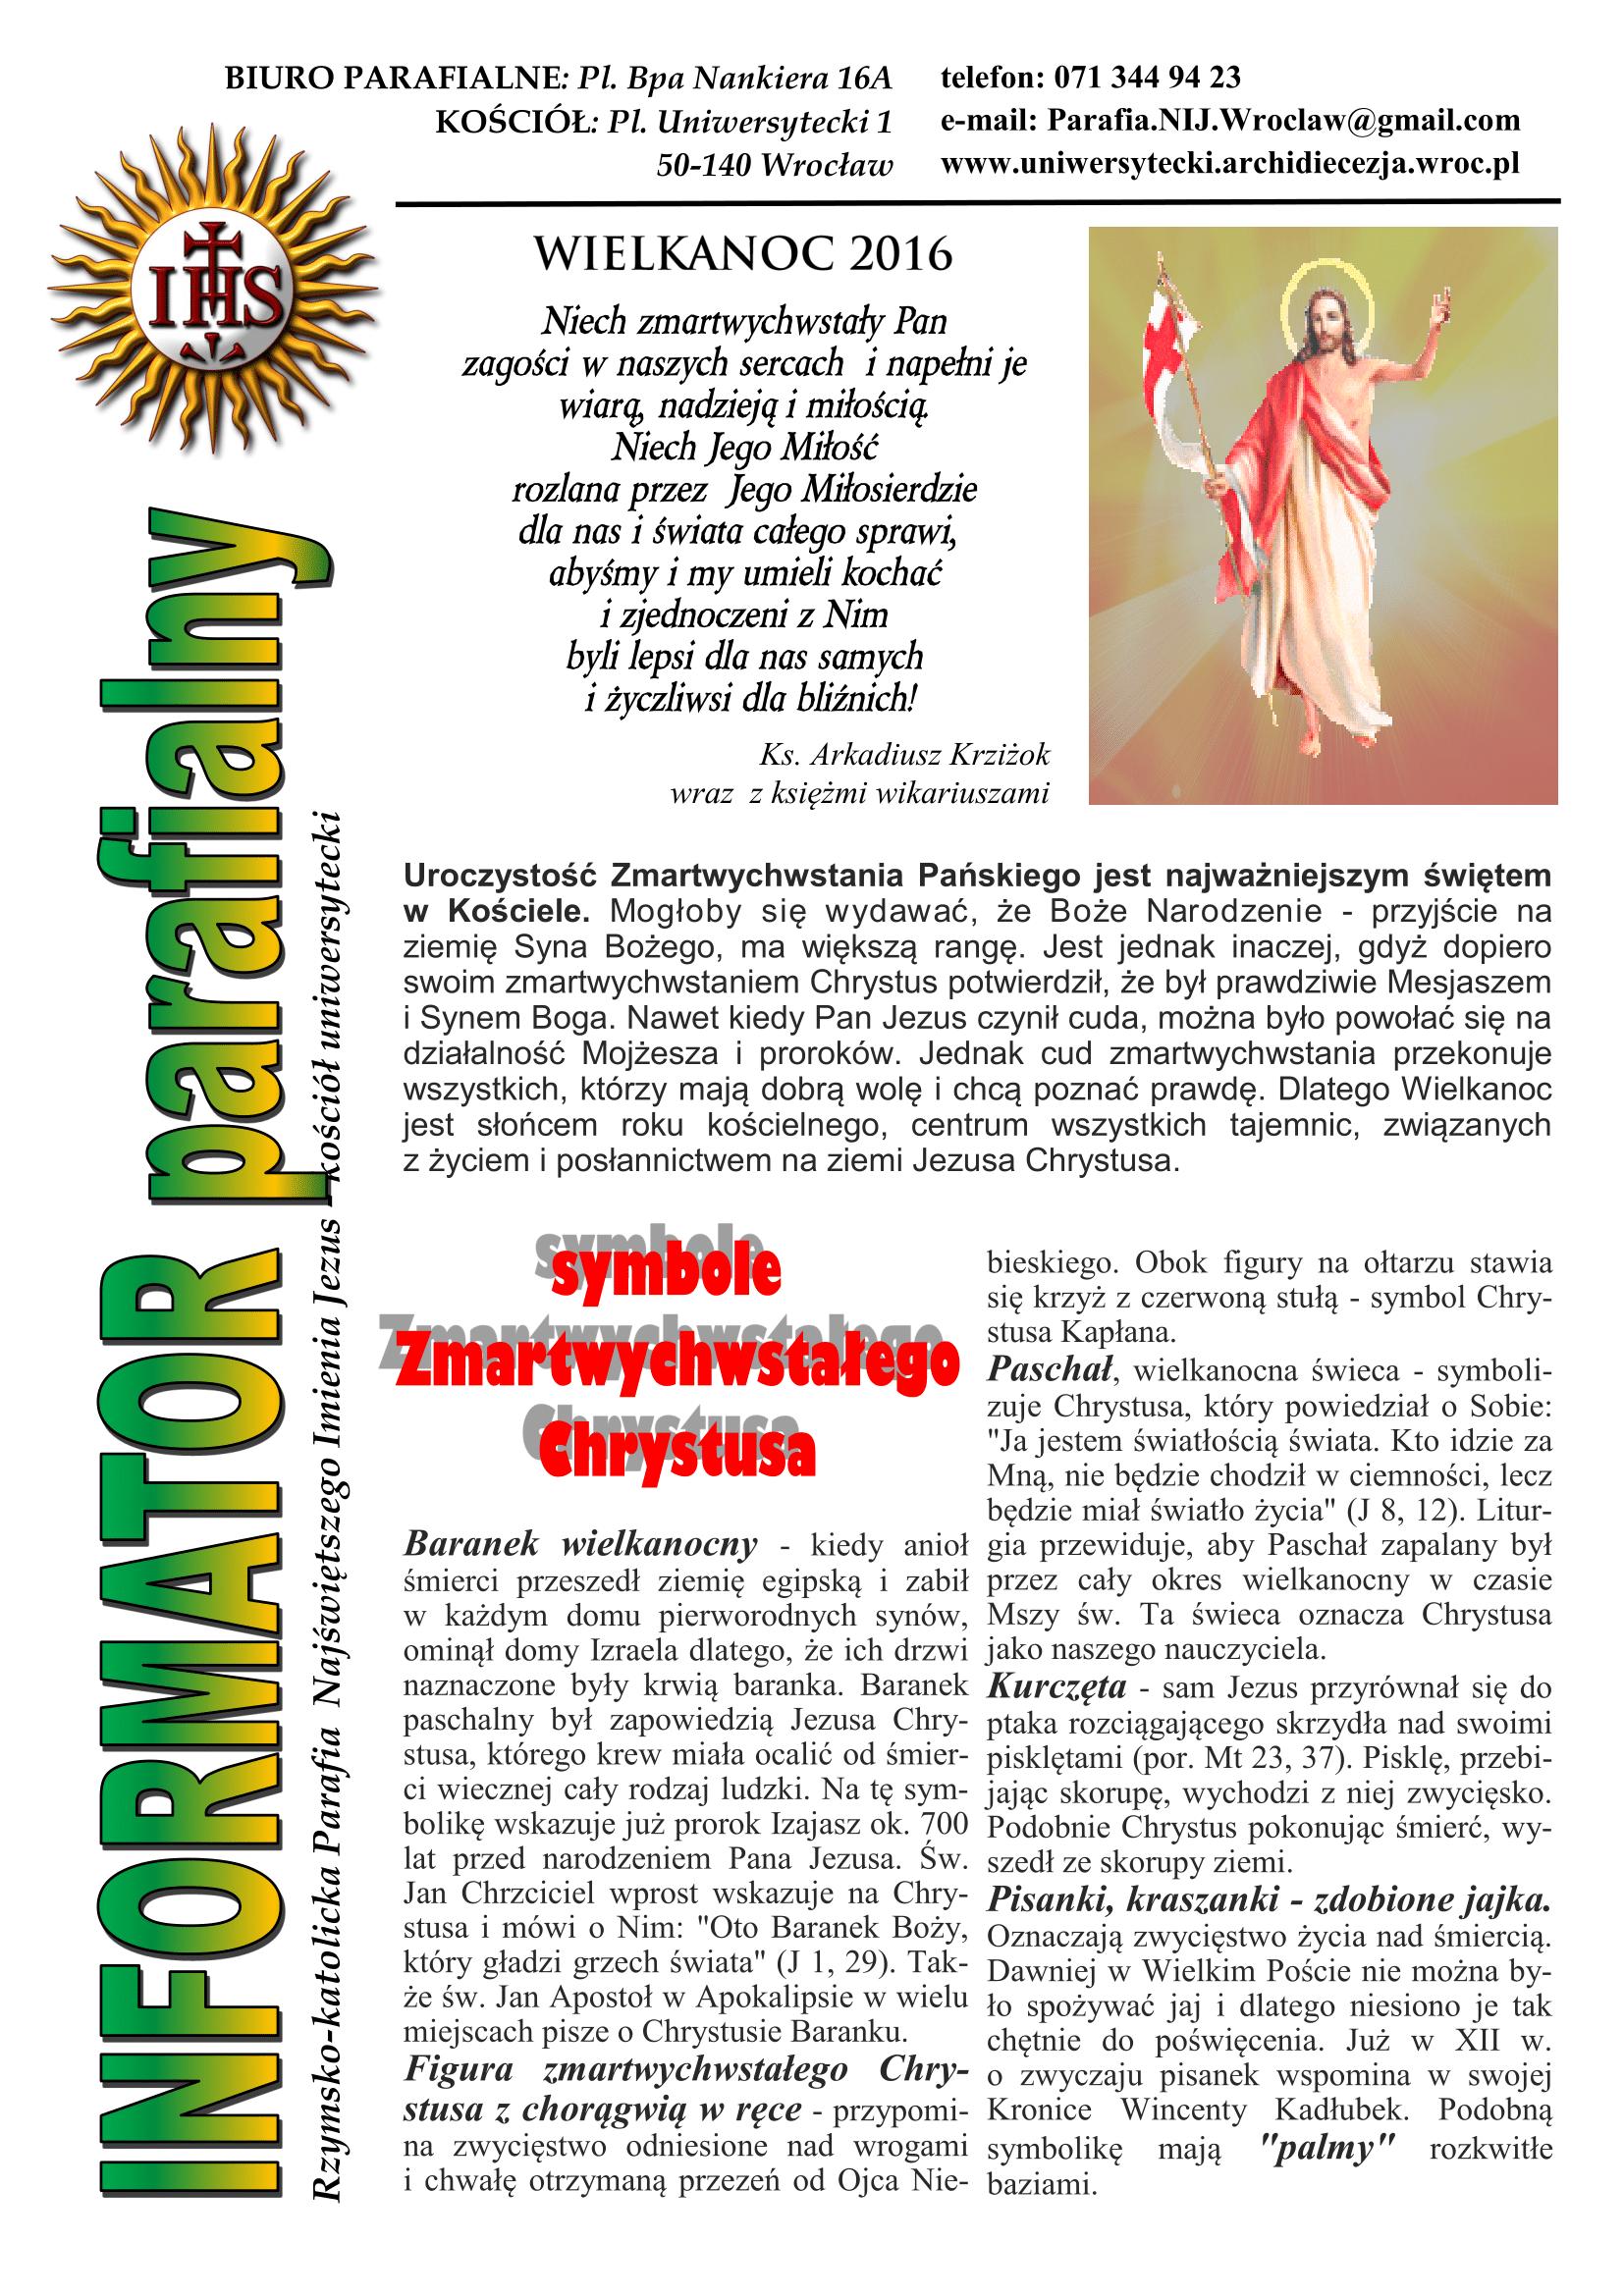 BIULETYN 7 Wielkanoc 2016